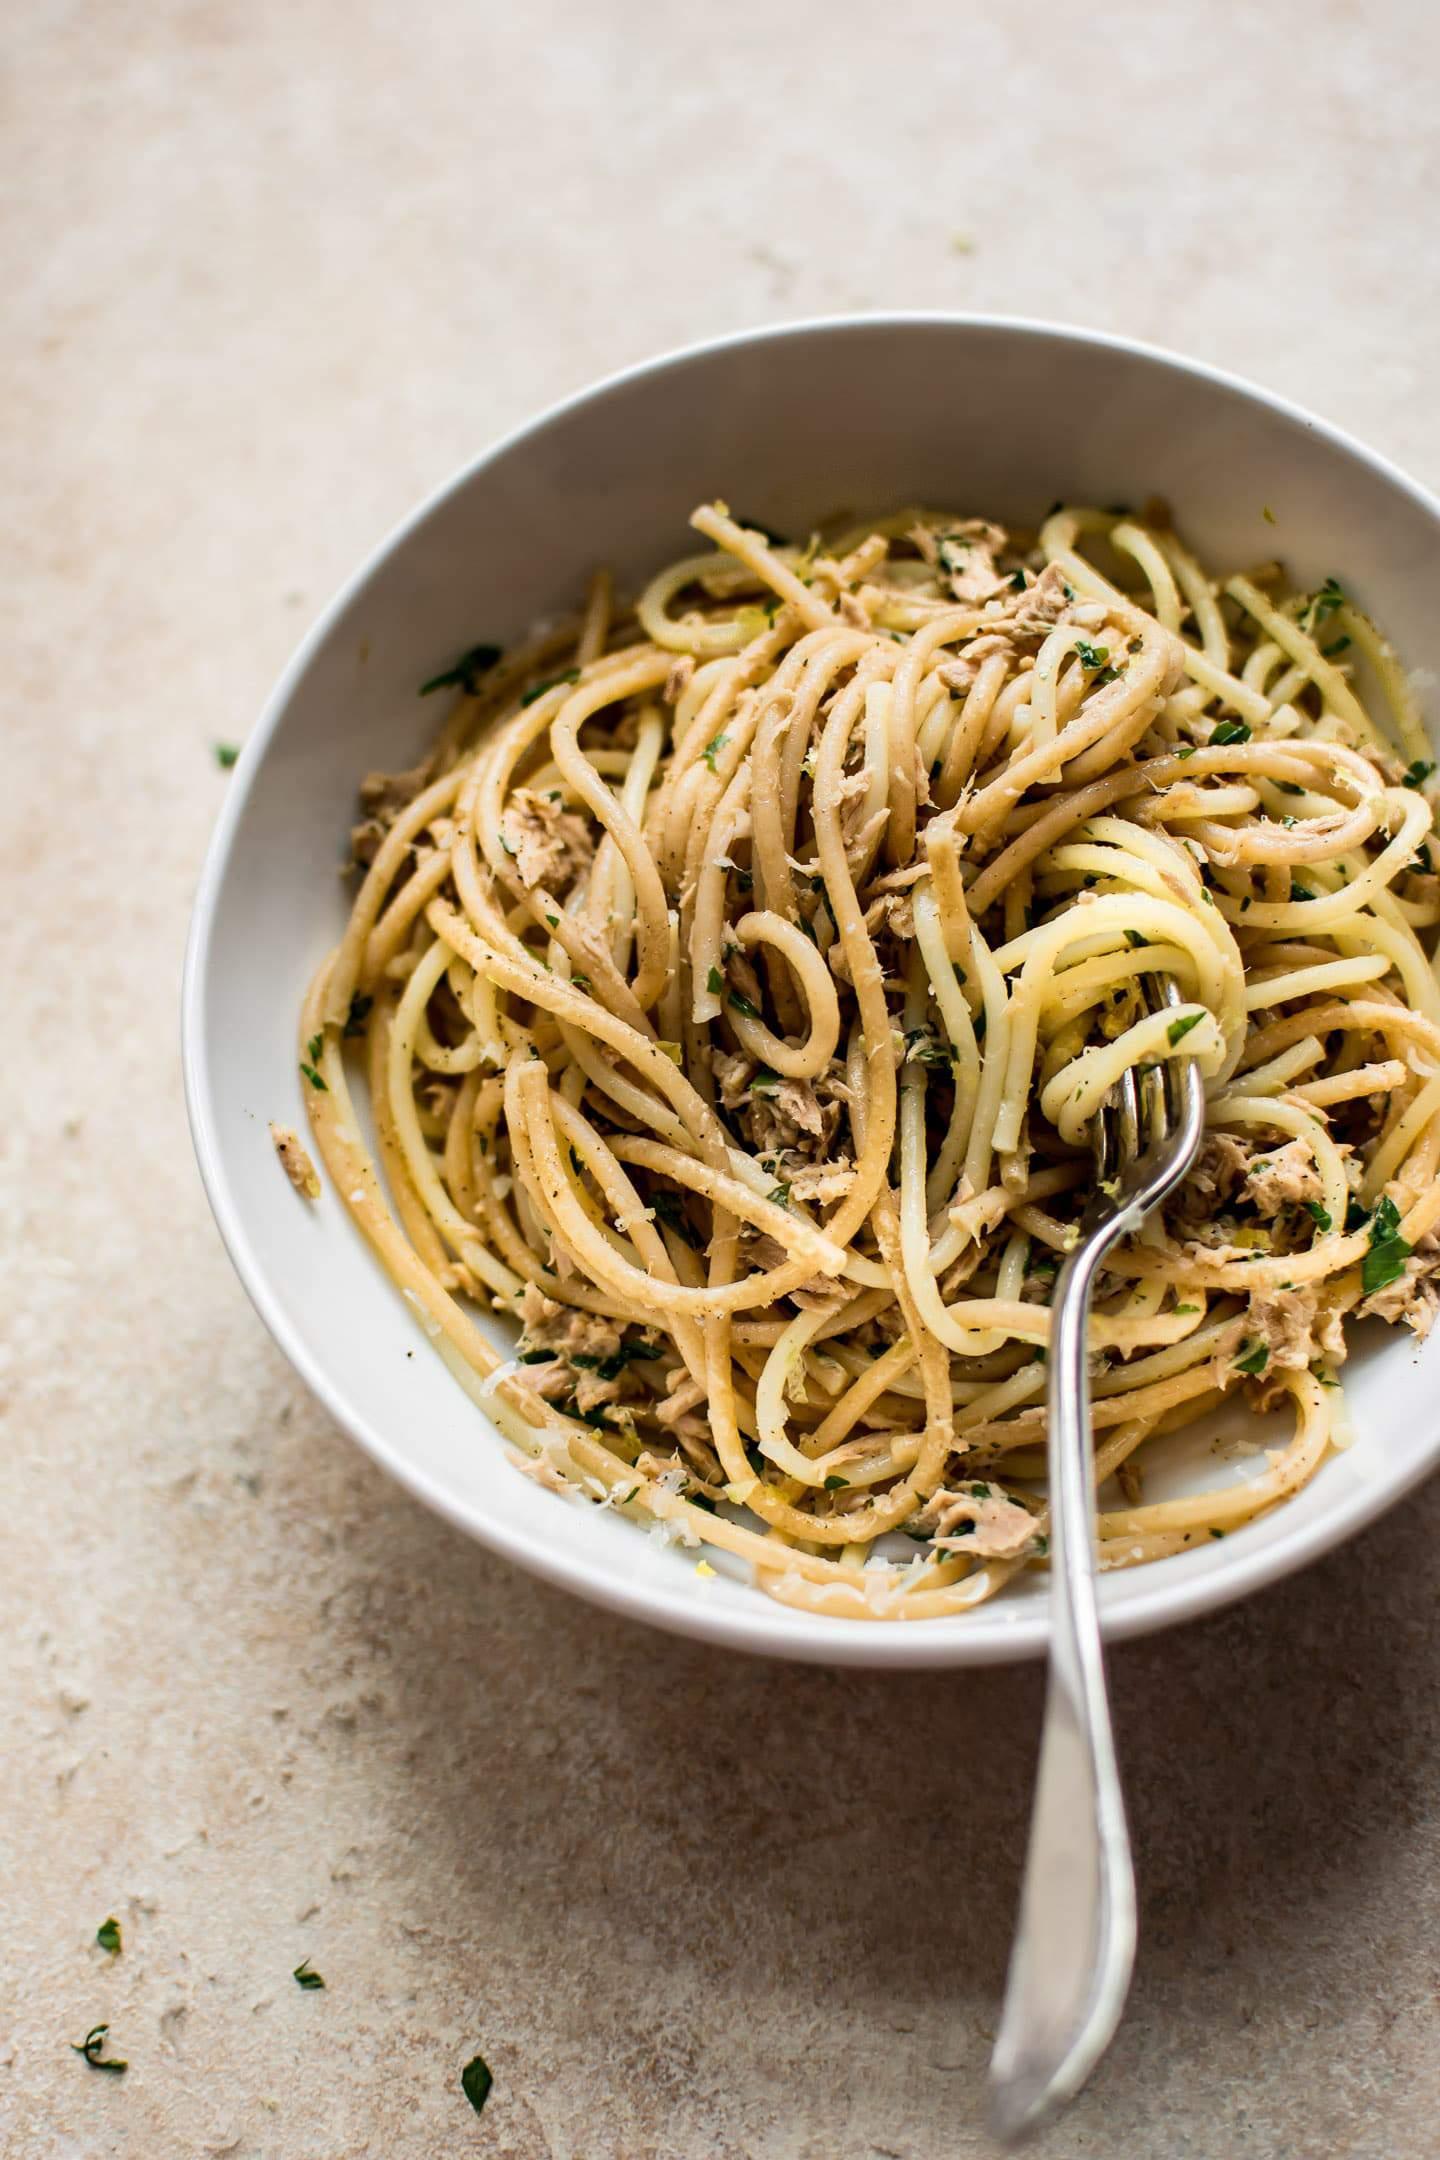 "Quick and easy canned tuna pasta ""width ="" 1440 ""height ="" 2160 ""srcset ="" https://cdn.diys.com/wp-content/uploads/2020/06/Fast-and-easy-canned-tuna - pasta.jpg 1440w, https://cdn.diys.com/wp-content/uploads/2020/06/Fast-and-easy-canned-canned-tuna-pasta-200x300.jpg 200w, https: // cdn .diys. com / wp-content / uploads / 2020/06 / Quick and easy canned tuna pasta-683x1024.jpg 683w, https://cdn.diys.com/wp-content/uploads/2020/06/Fast -and lightly canned tuna -macaroni-768x1152.jpg 768w, https://cdn.diys.com/wp-content/uploads/2020/06/Fast-and-easy- canned-tuna-pasta-1024x1536. jpg 1024w, https://cdn.diys.com/wp-content/uploads/2020/06/Fast-and-easy-canned-tuna-pasta-1365x2048.jpg 1365w ""dimensions ="" (maximum width: 1440 pixels) 100 vw, 1440 pixels"